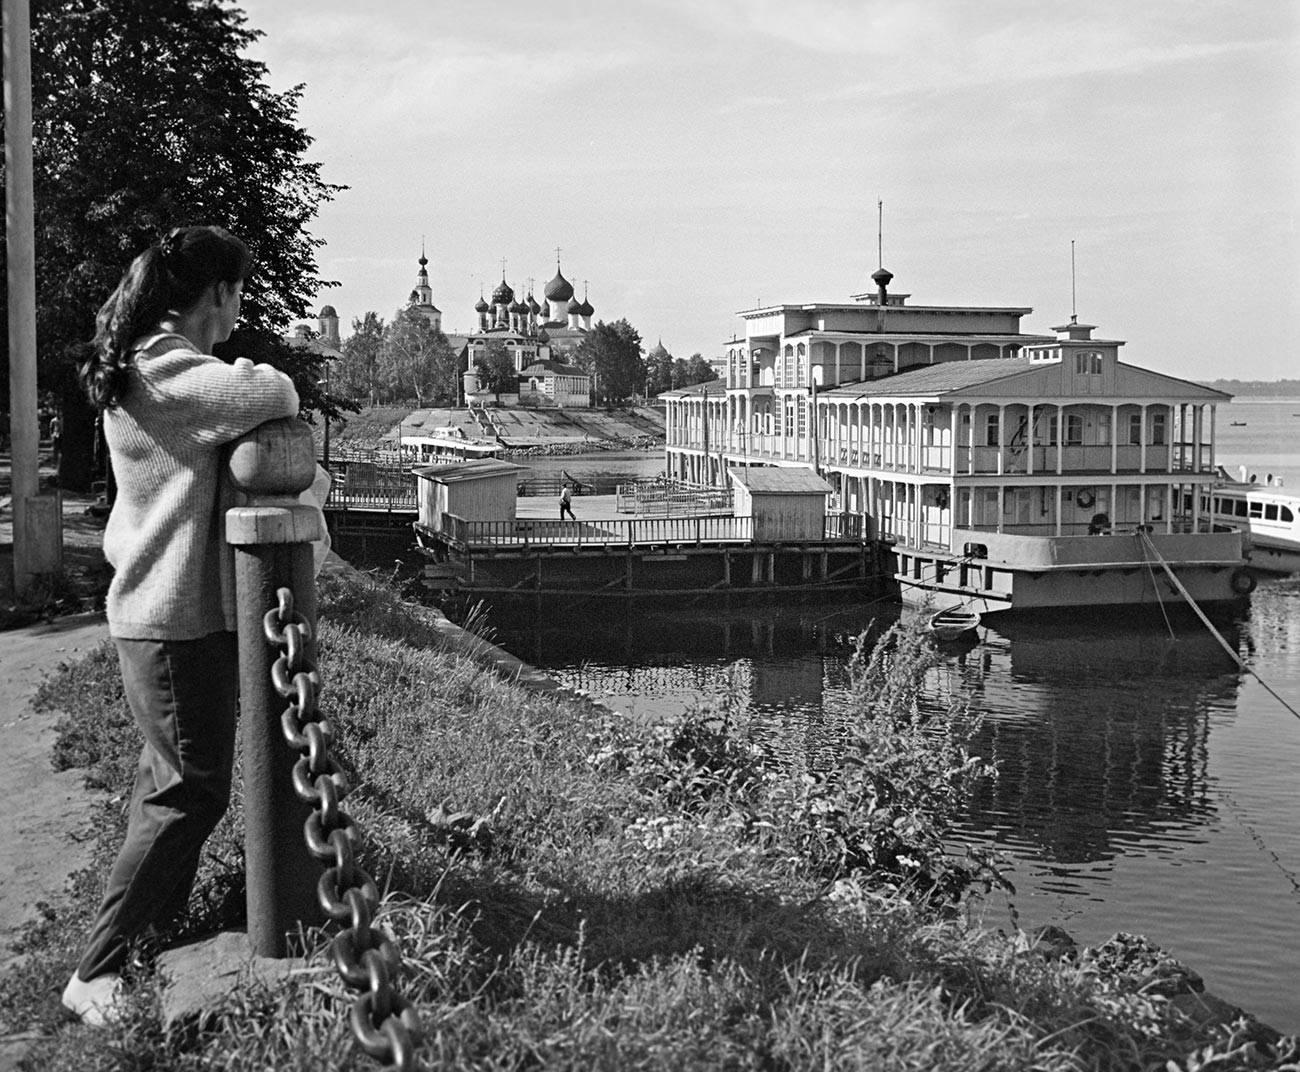 Terminal fluvial e iglesia en Uglich, 1965.